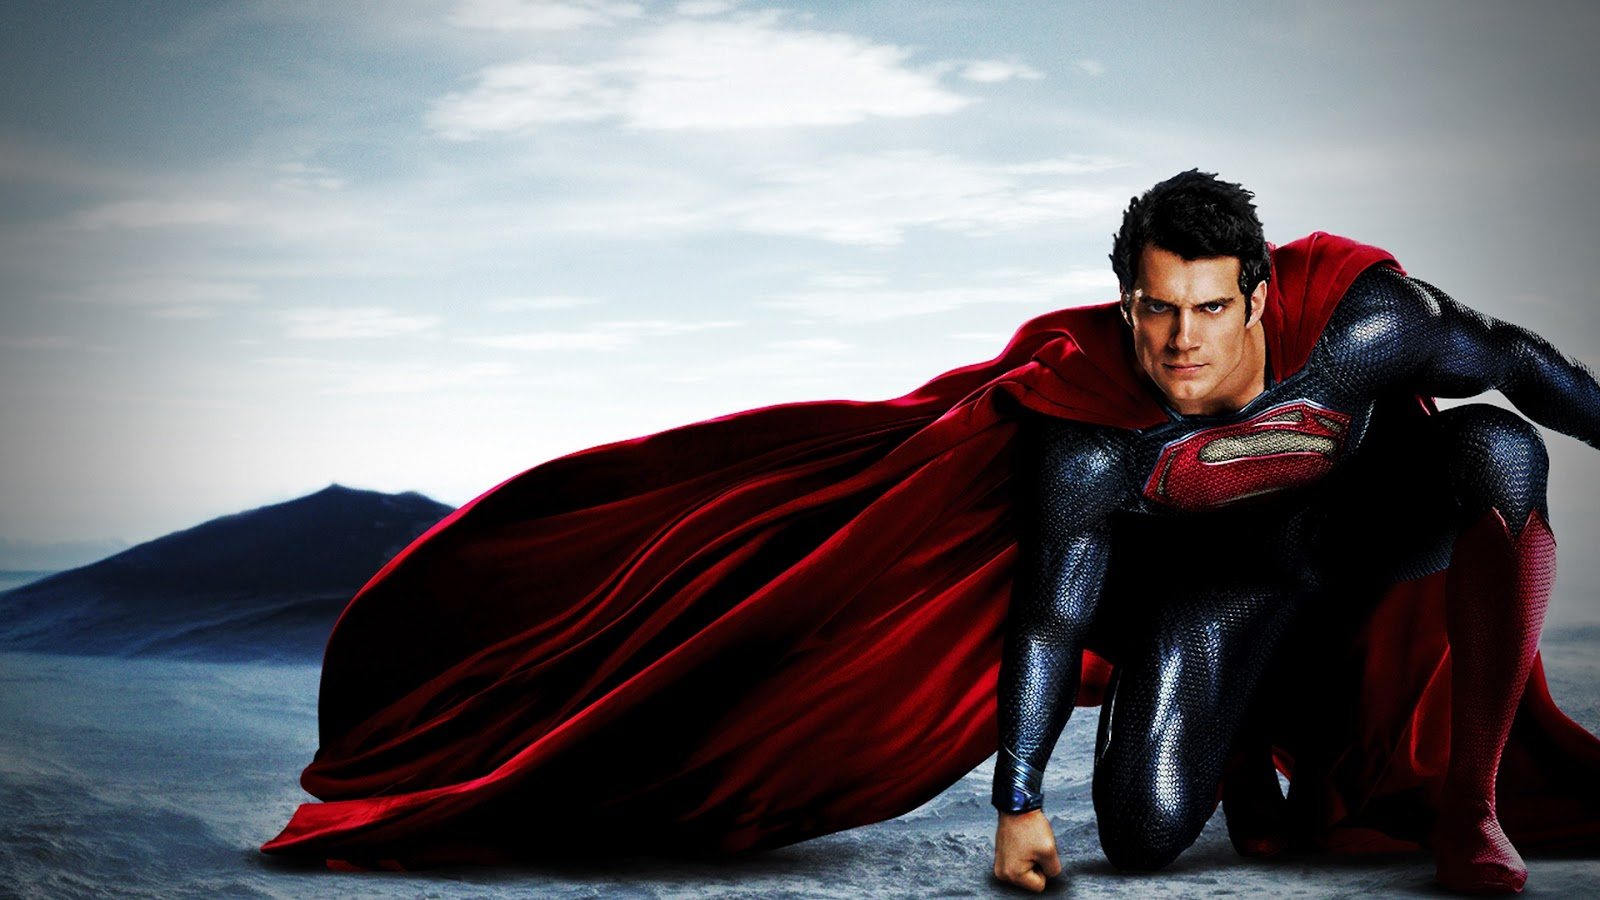 Man-of-Steel-movie-banner-image